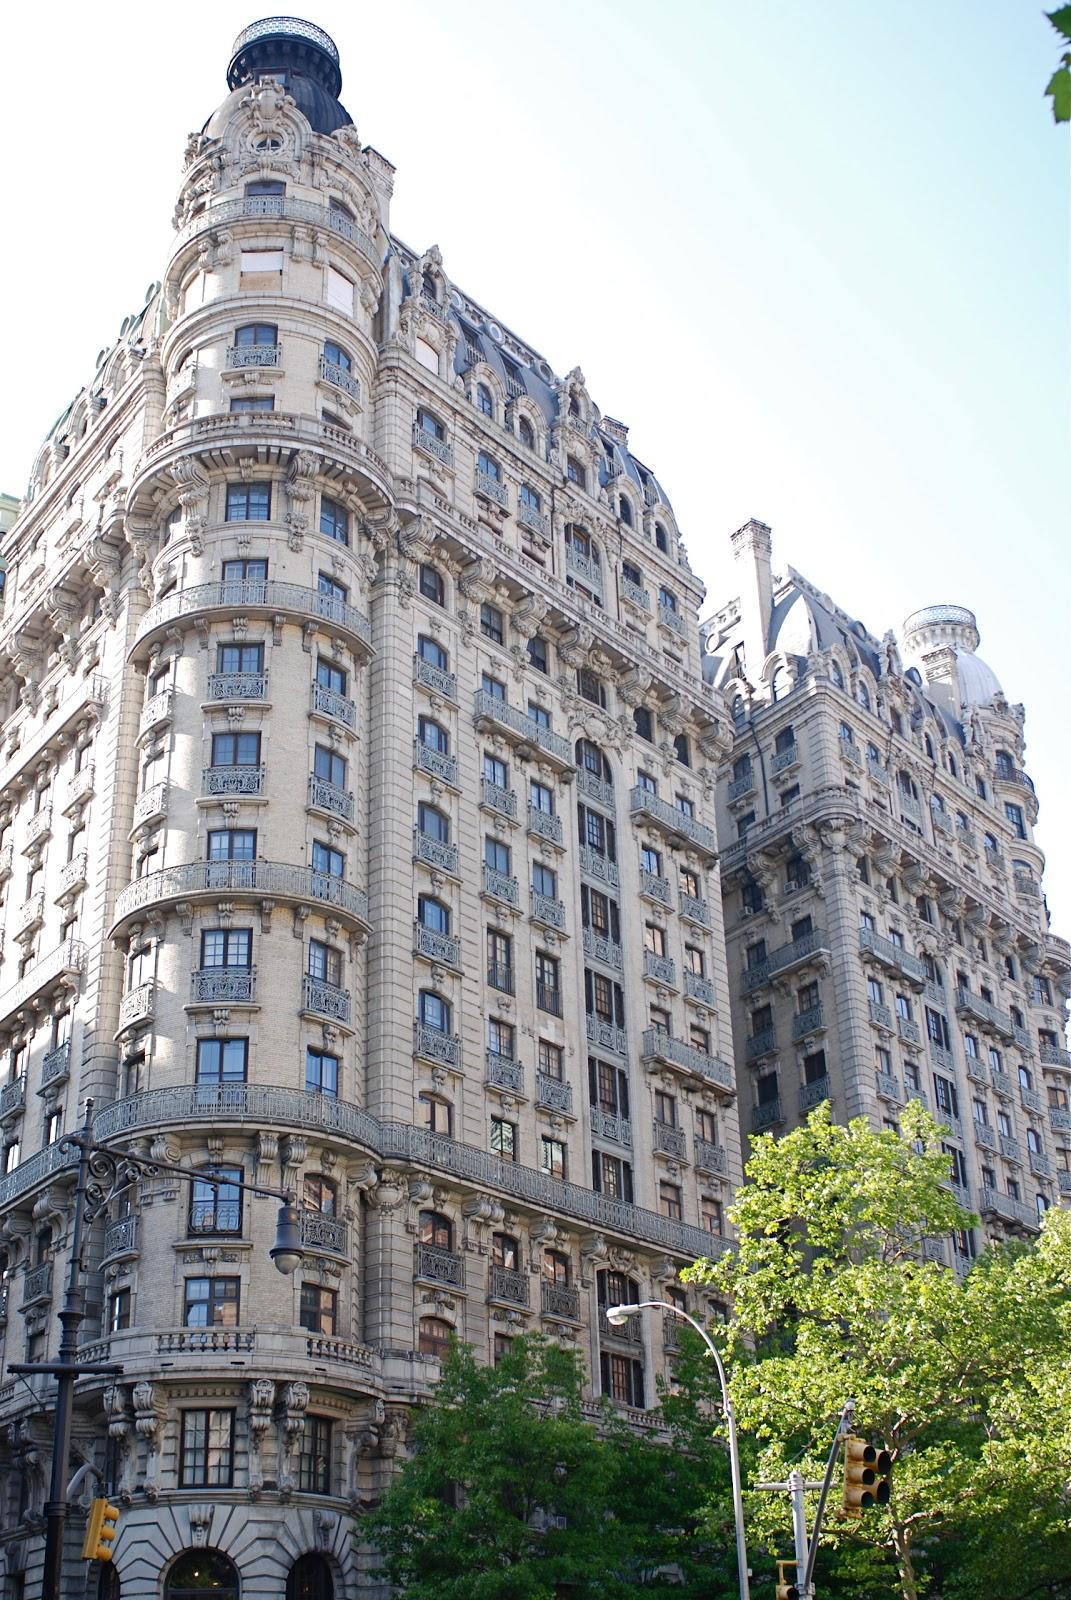 NYC ♥ NYC: The Ansonia